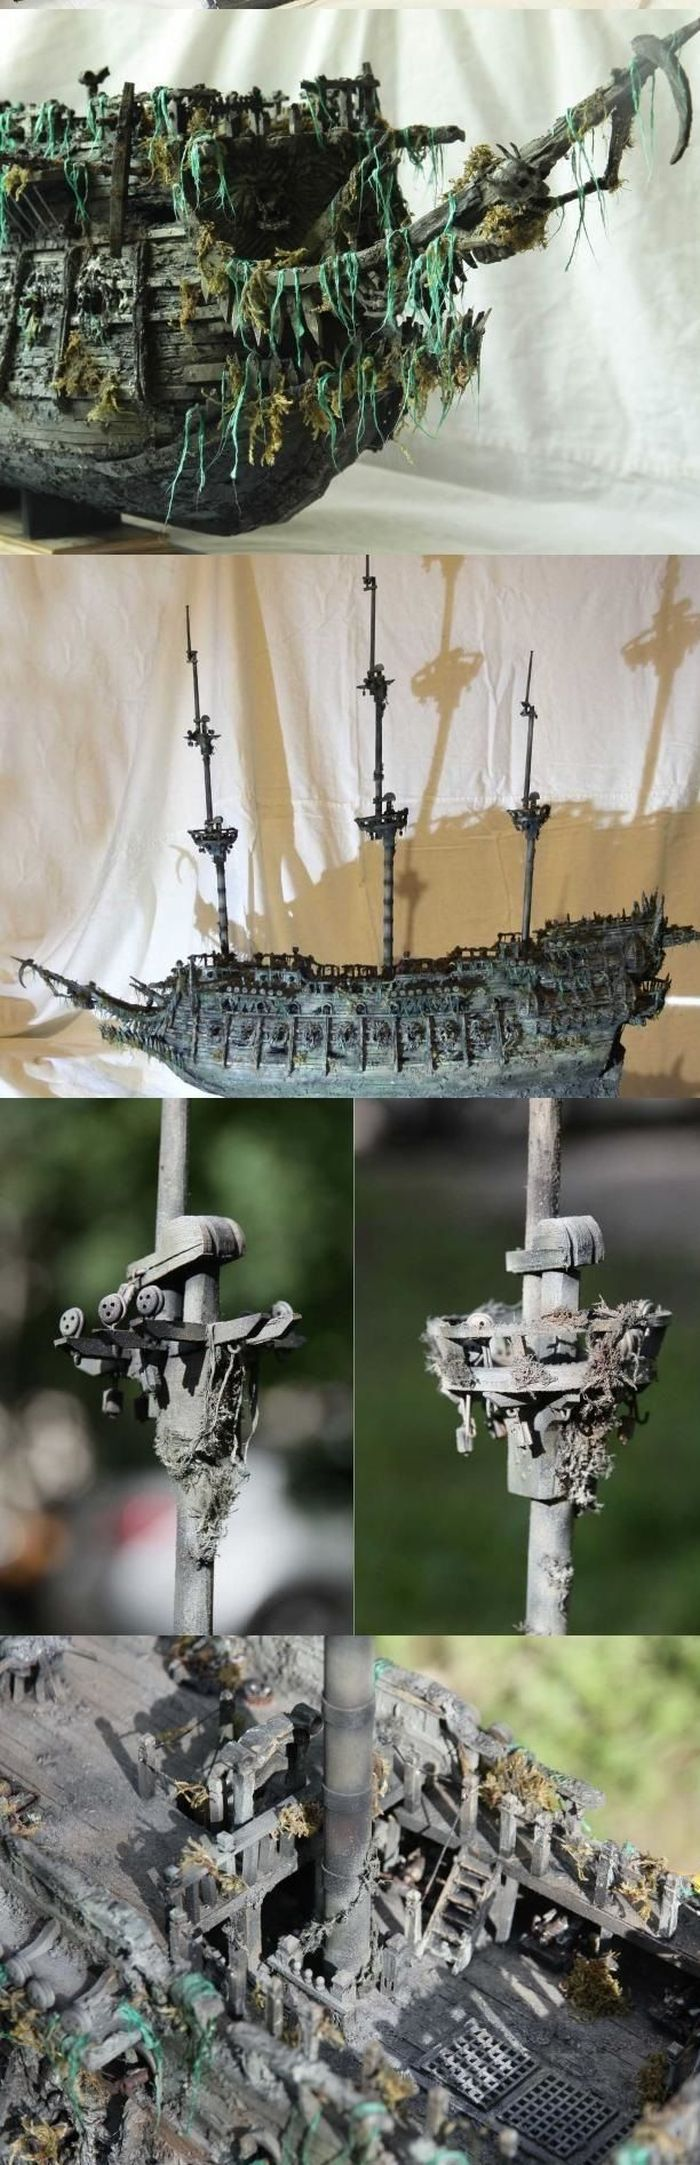 The Flying Dutchman Model (21 pics)